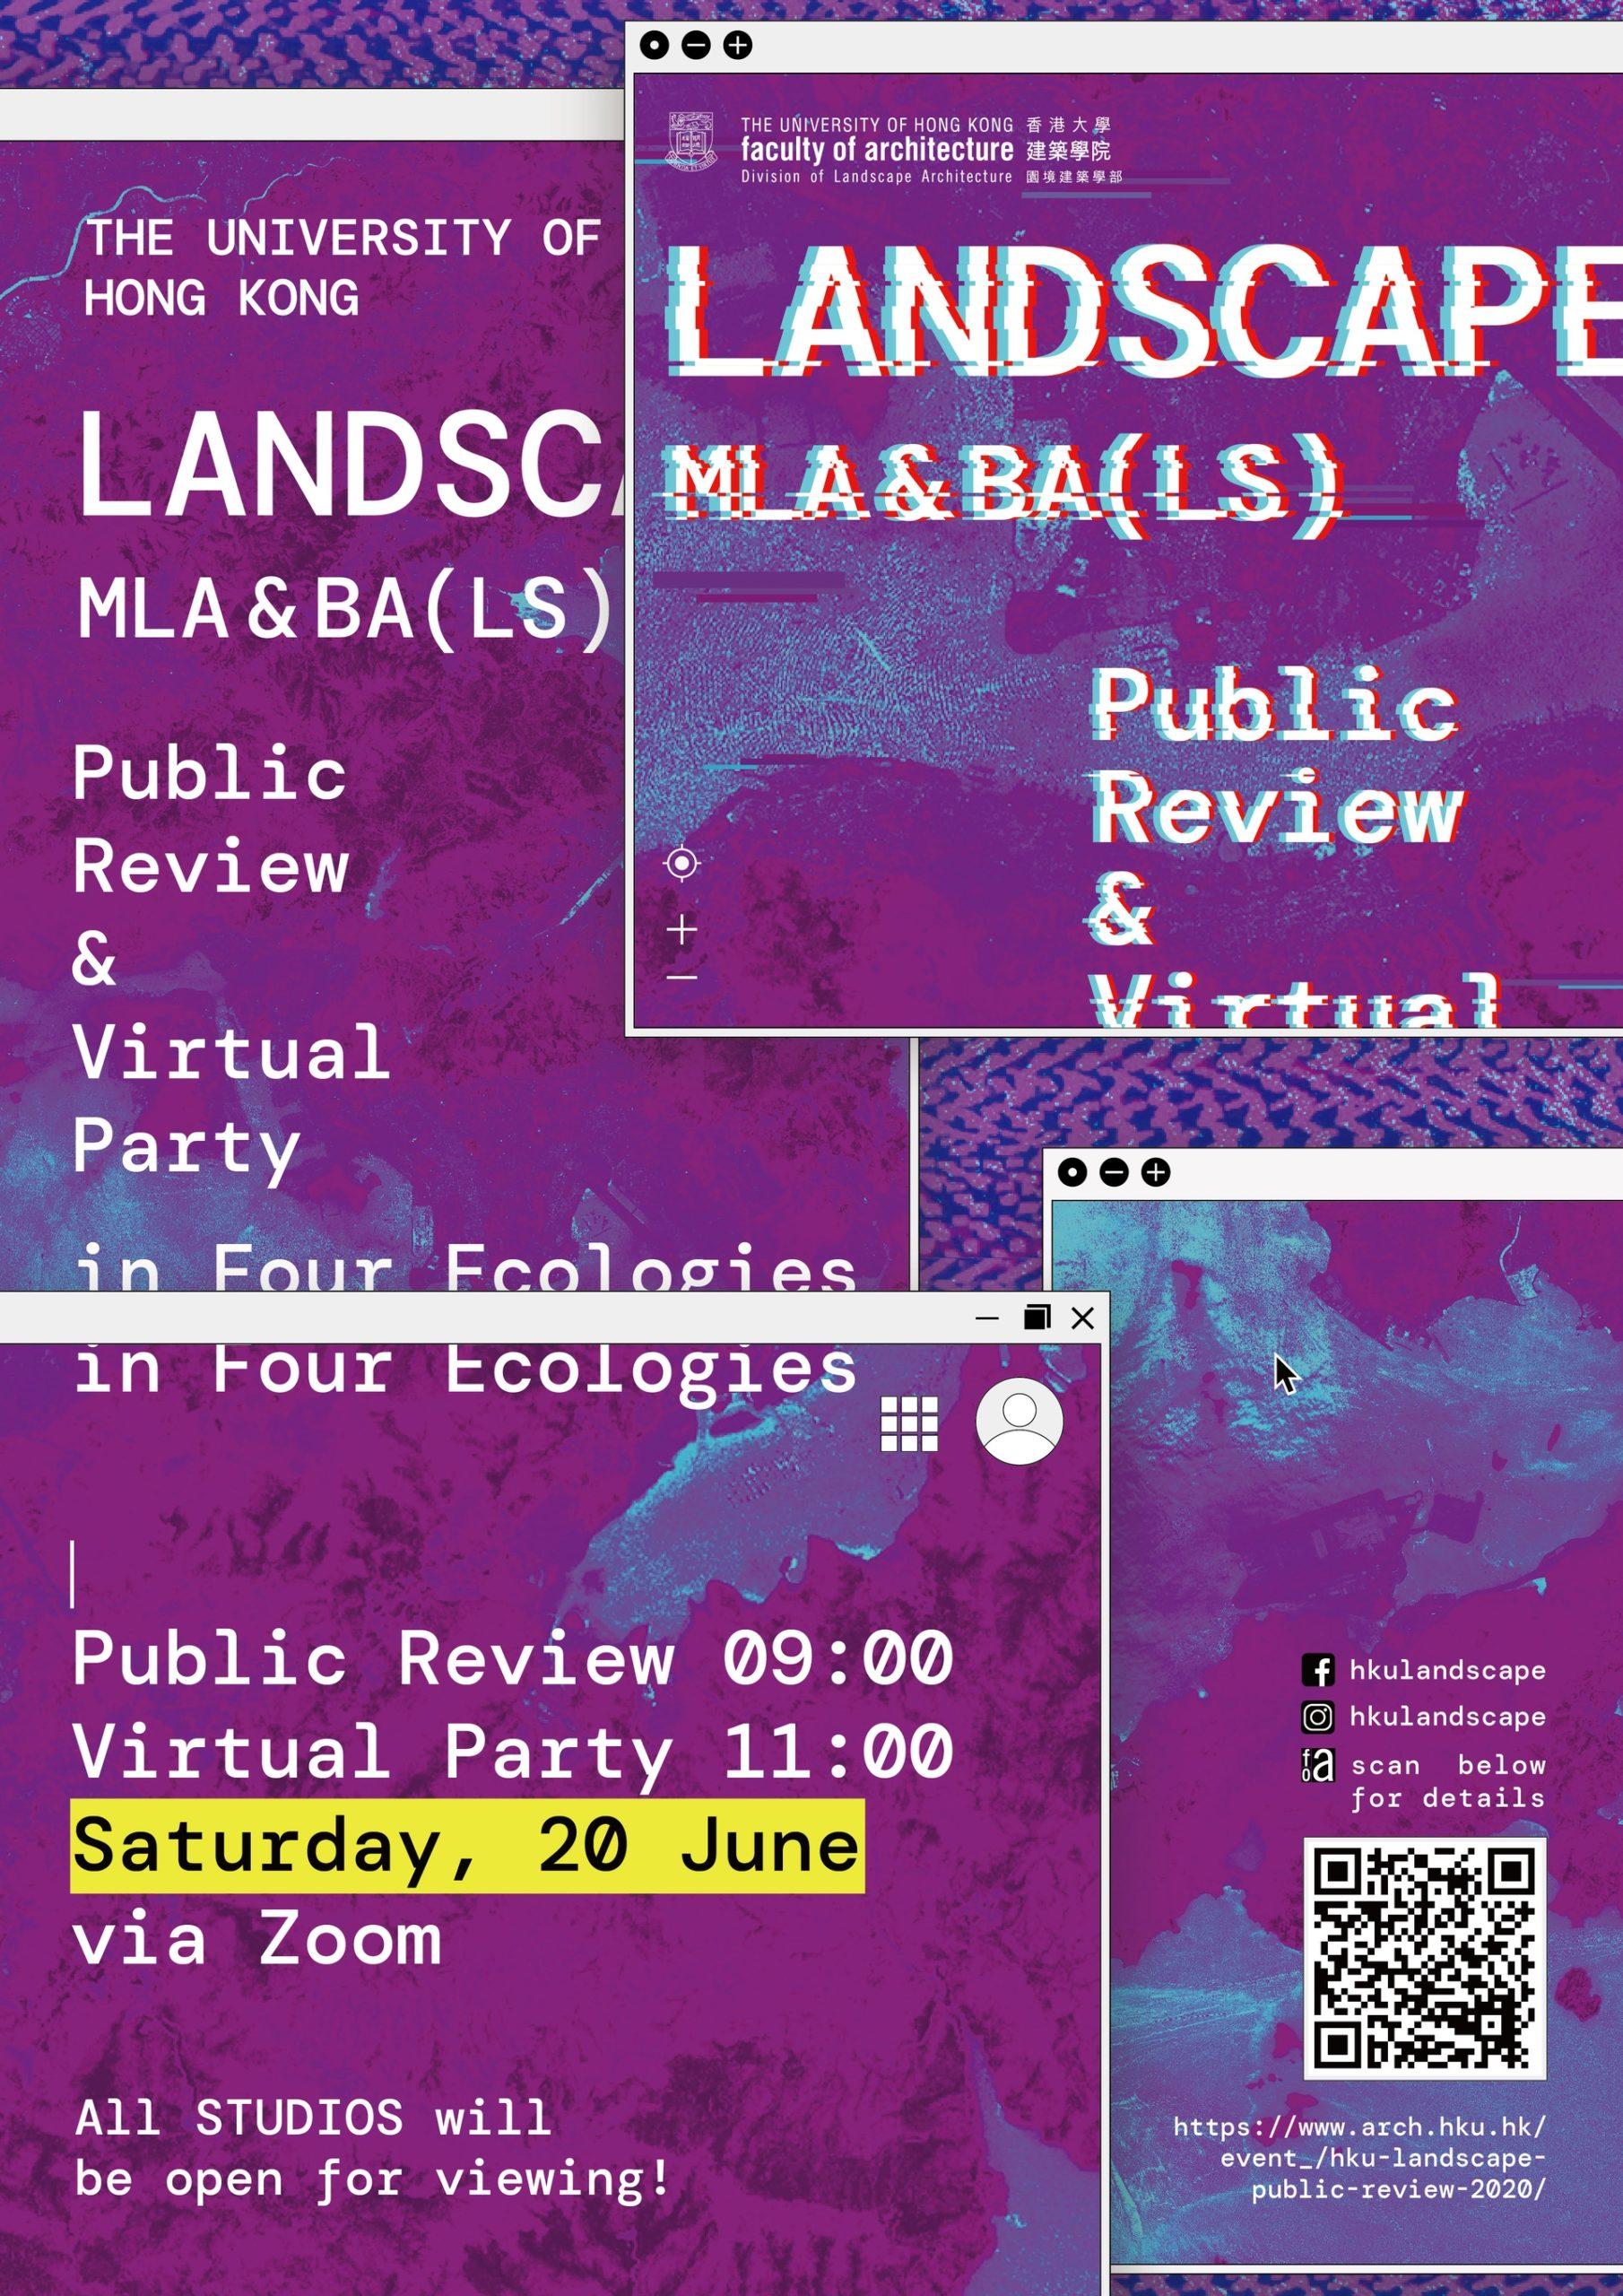 HKU Landscape Public Review & Virtual Party in Four Ecologies